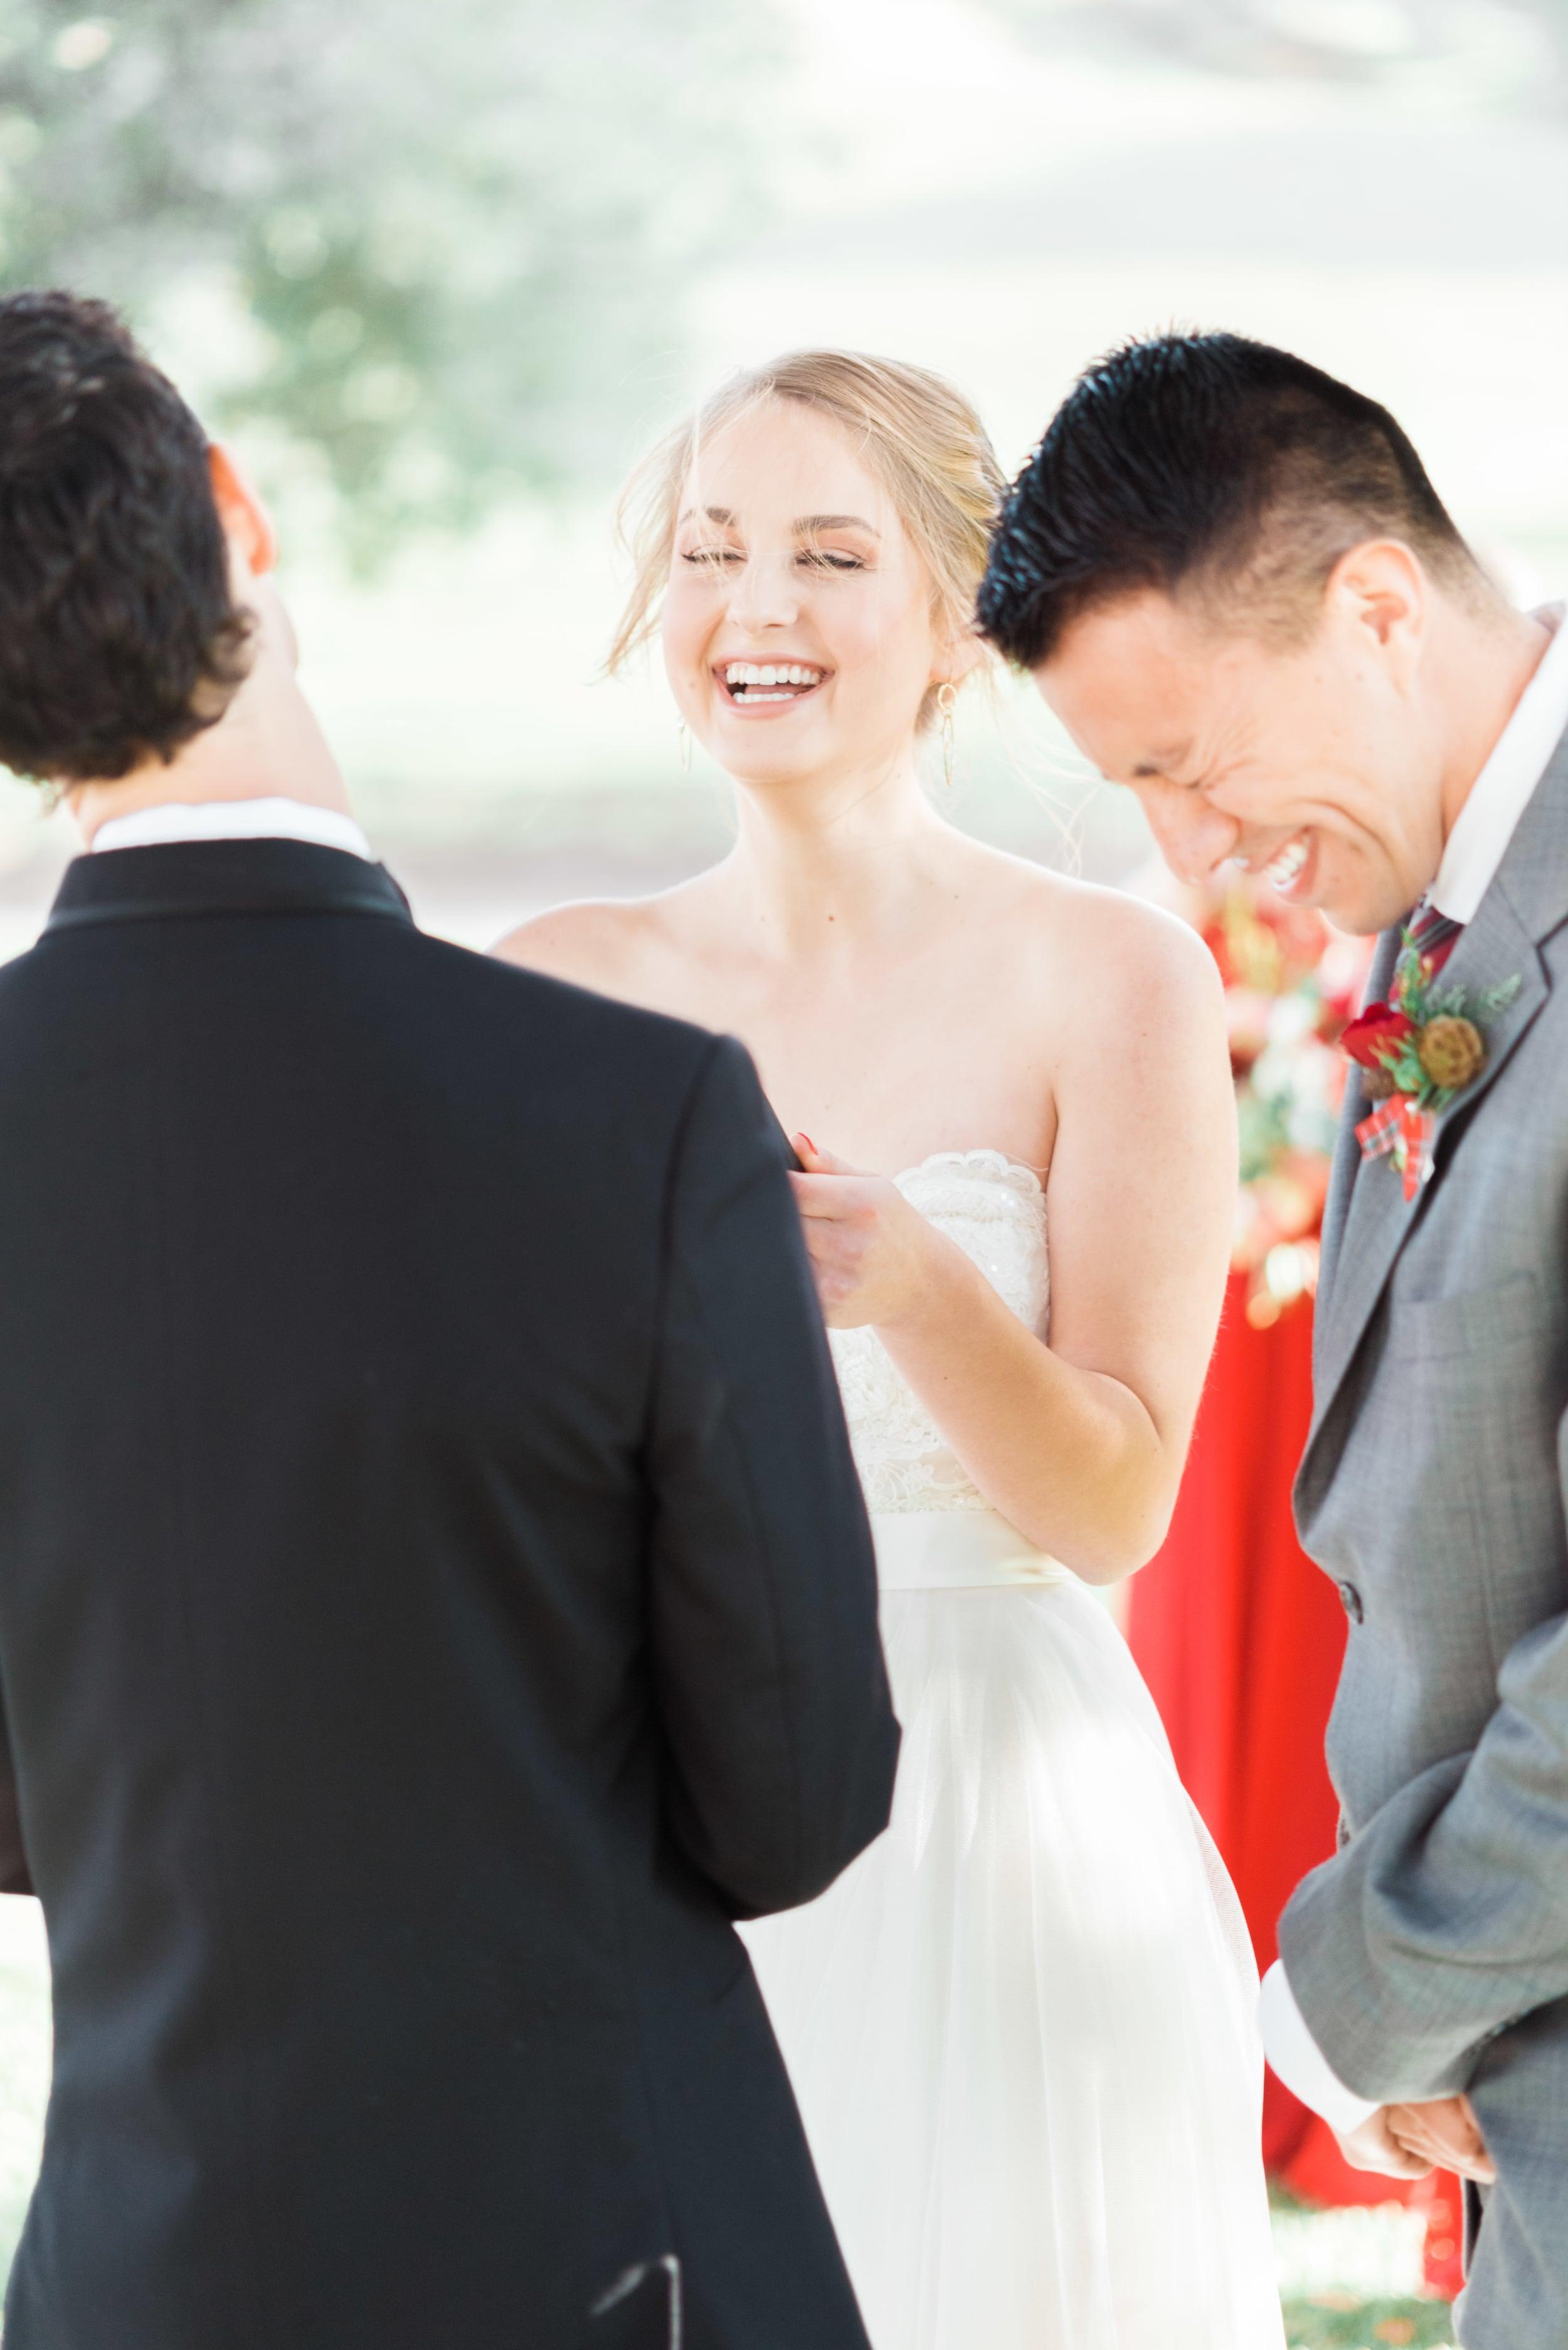 Natalie_Schutt_Photography_Winter_Wedding_San_Luis_Obispo-129.jpg